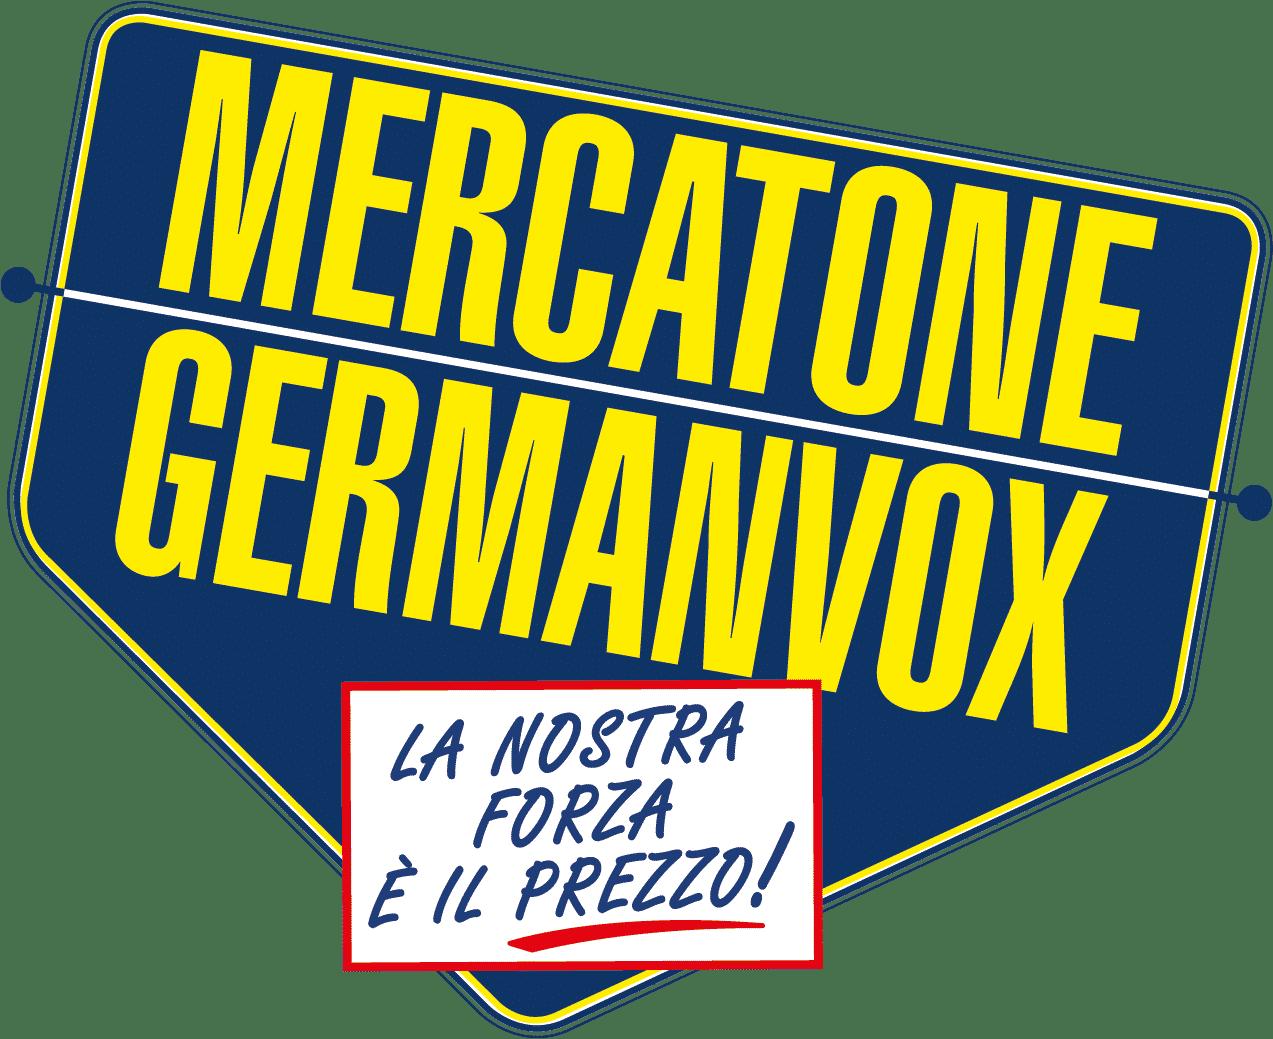 Germanvox